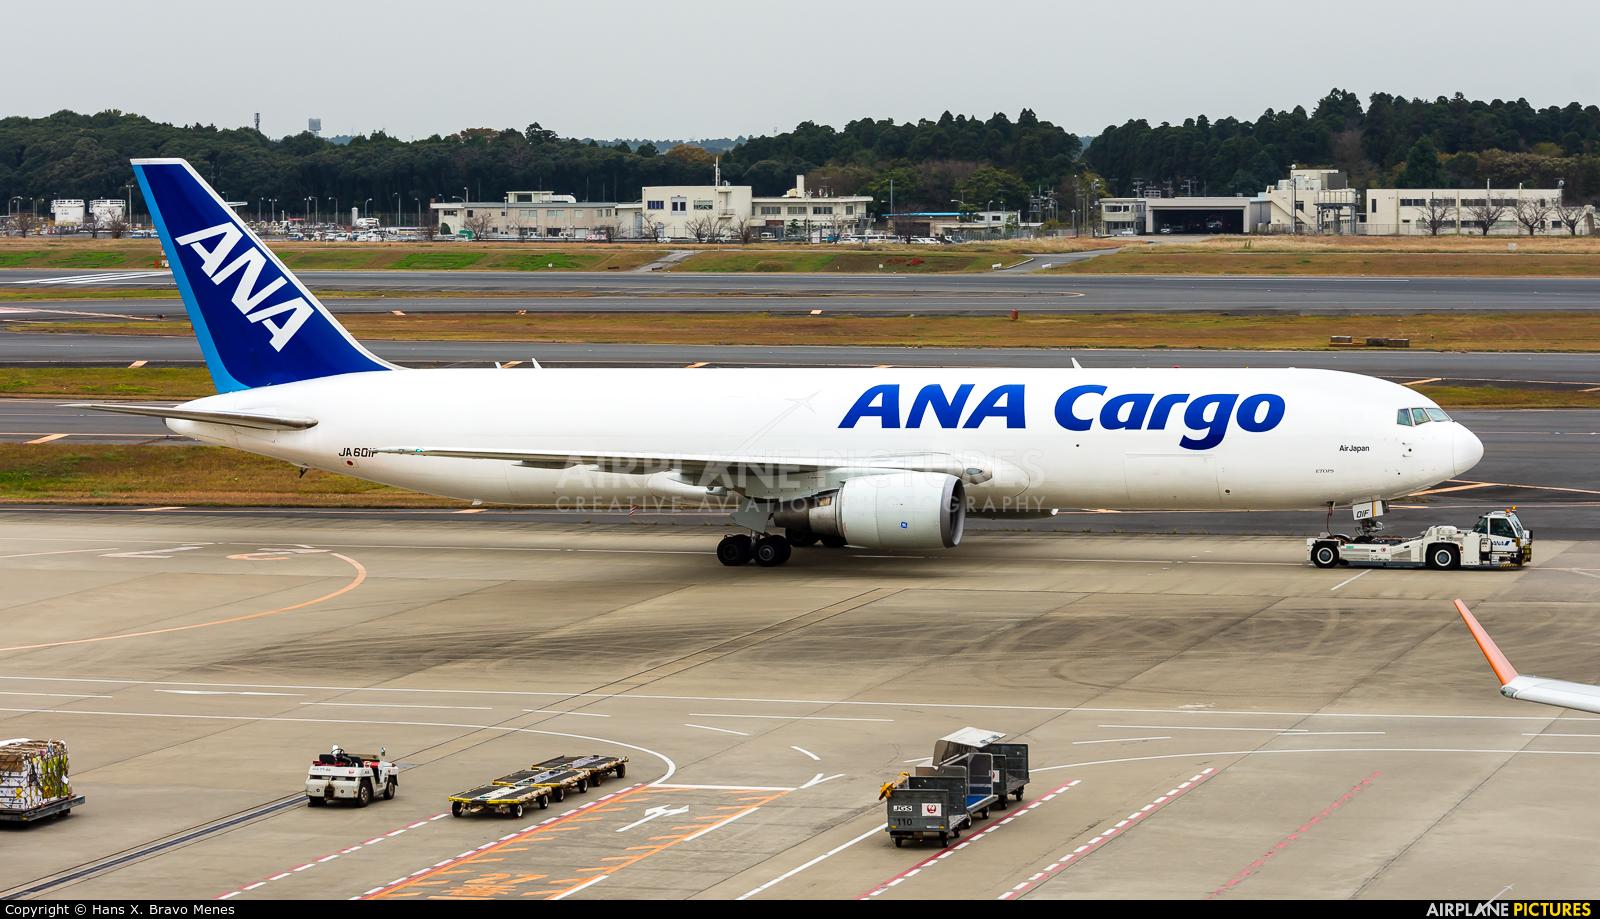 JA601F - ANA Cargo Boeing 767-300 at Tokyo - Narita Intl | Photo ID